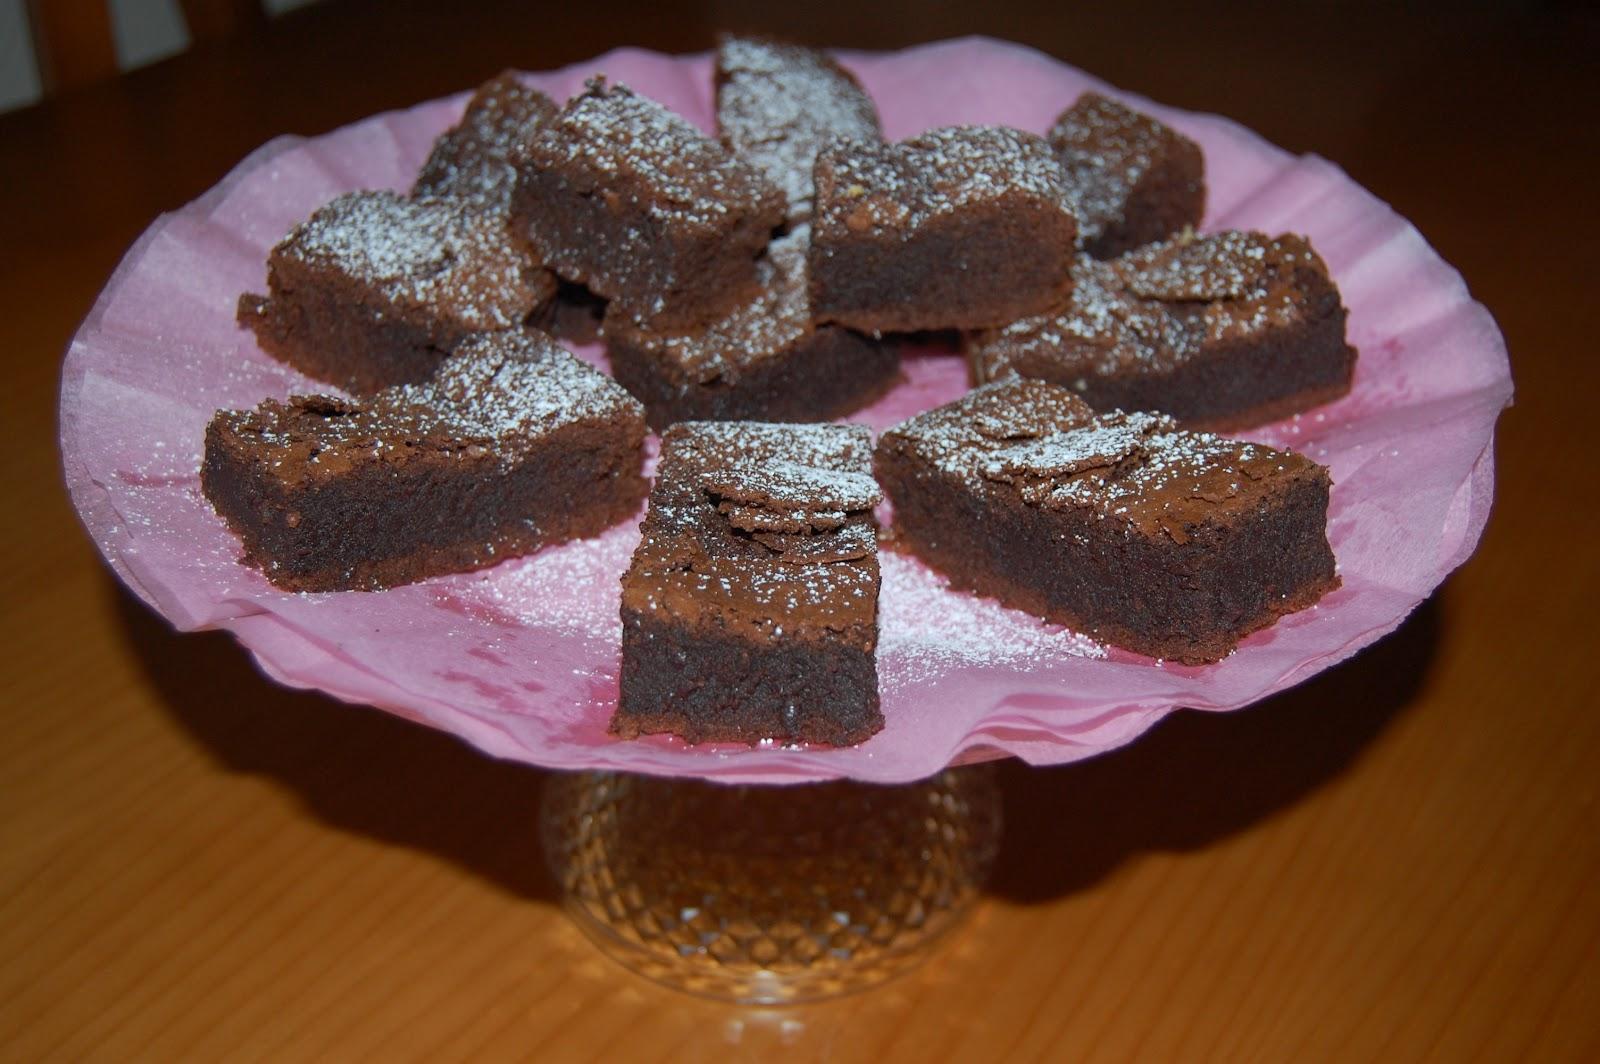 http://azucarenmicocina.blogspot.com.es/2012/05/mimosa-de-chocolate.html